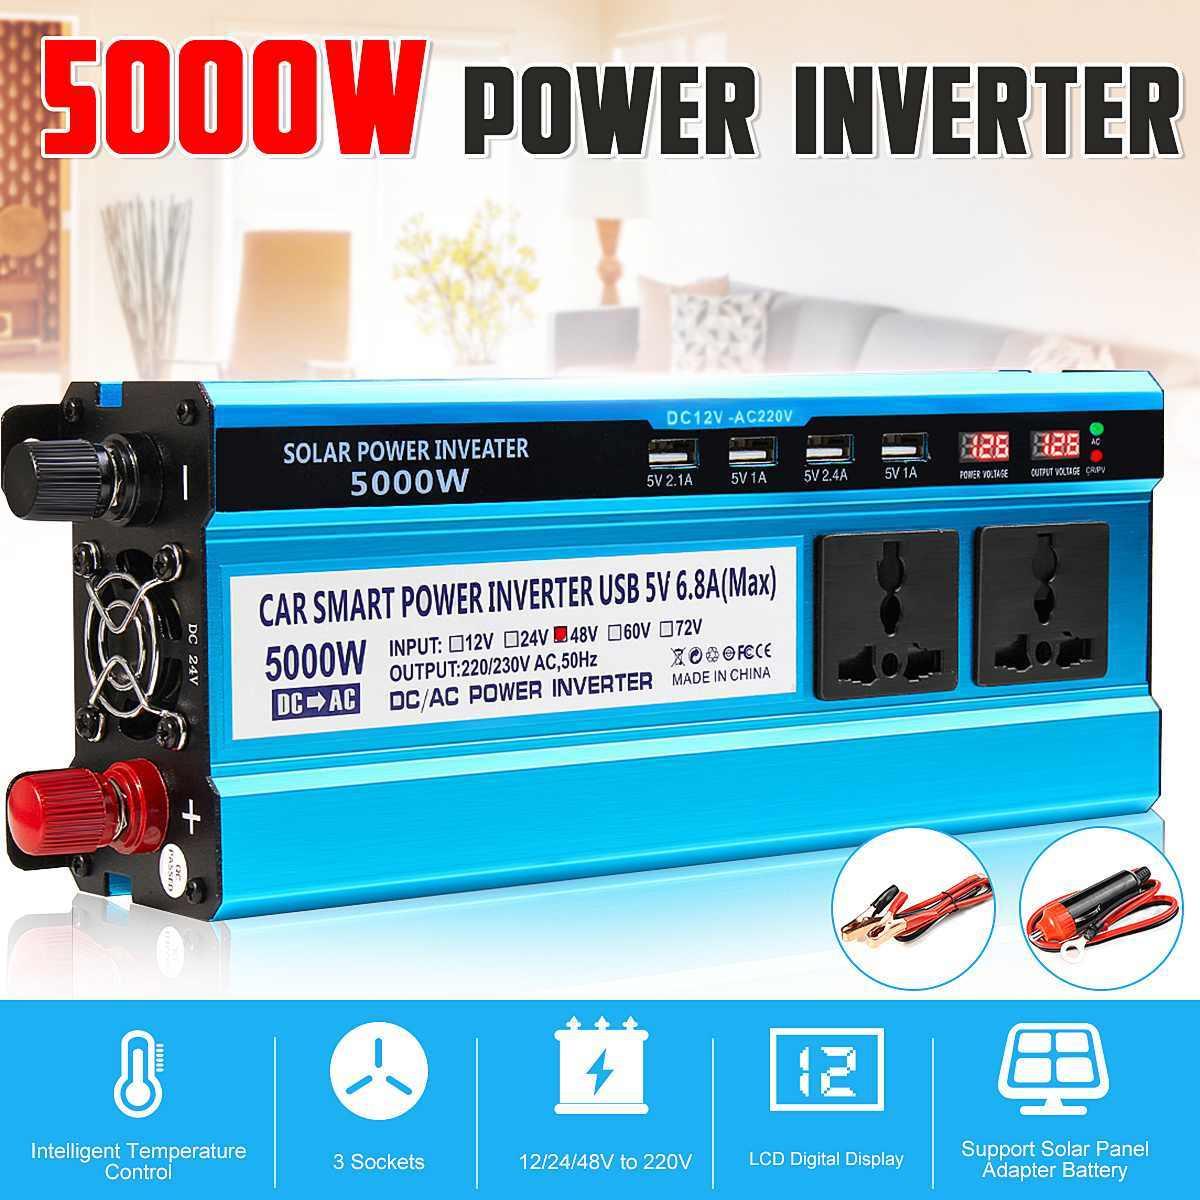 5000W Solar Power Inverter DC 12 V/24 V/48 V untuk AC 220V Tegangan Converter transformer Tampilan Ganda 3 Soket 4 Port USB